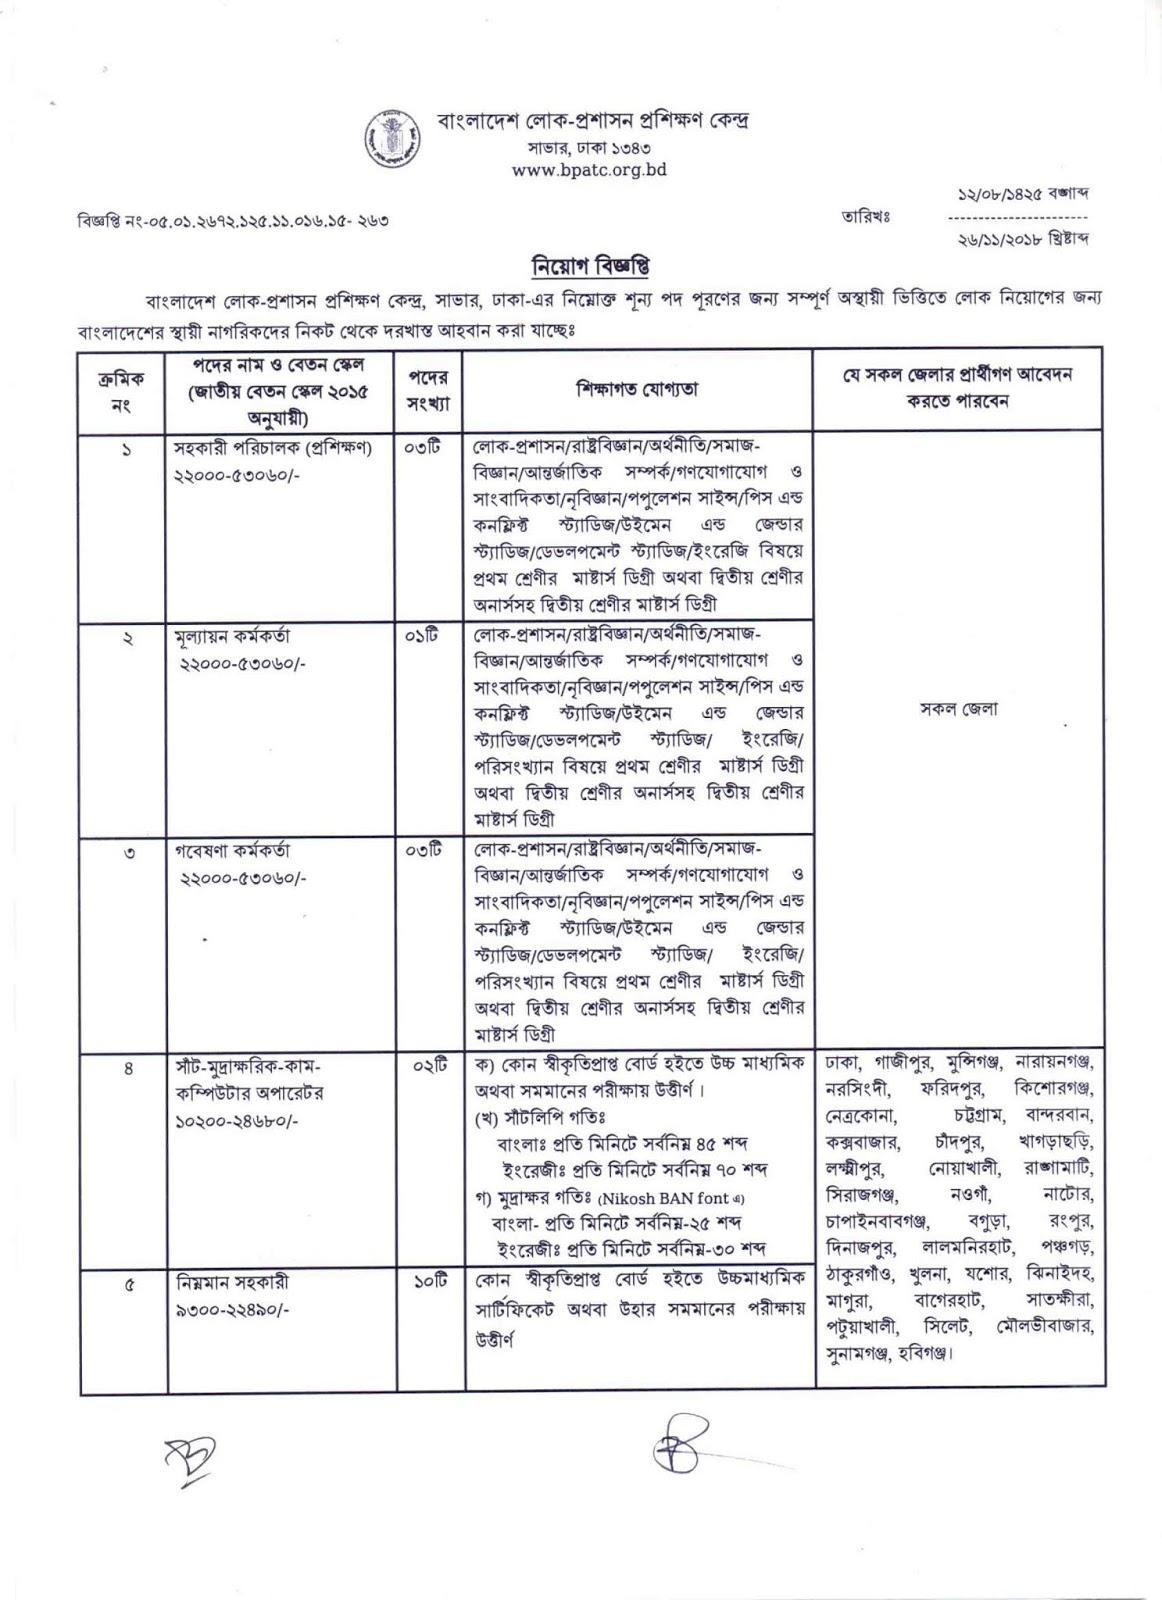 Bangladesh Public Administration Training Centre (BPATC) Job Circular 2018